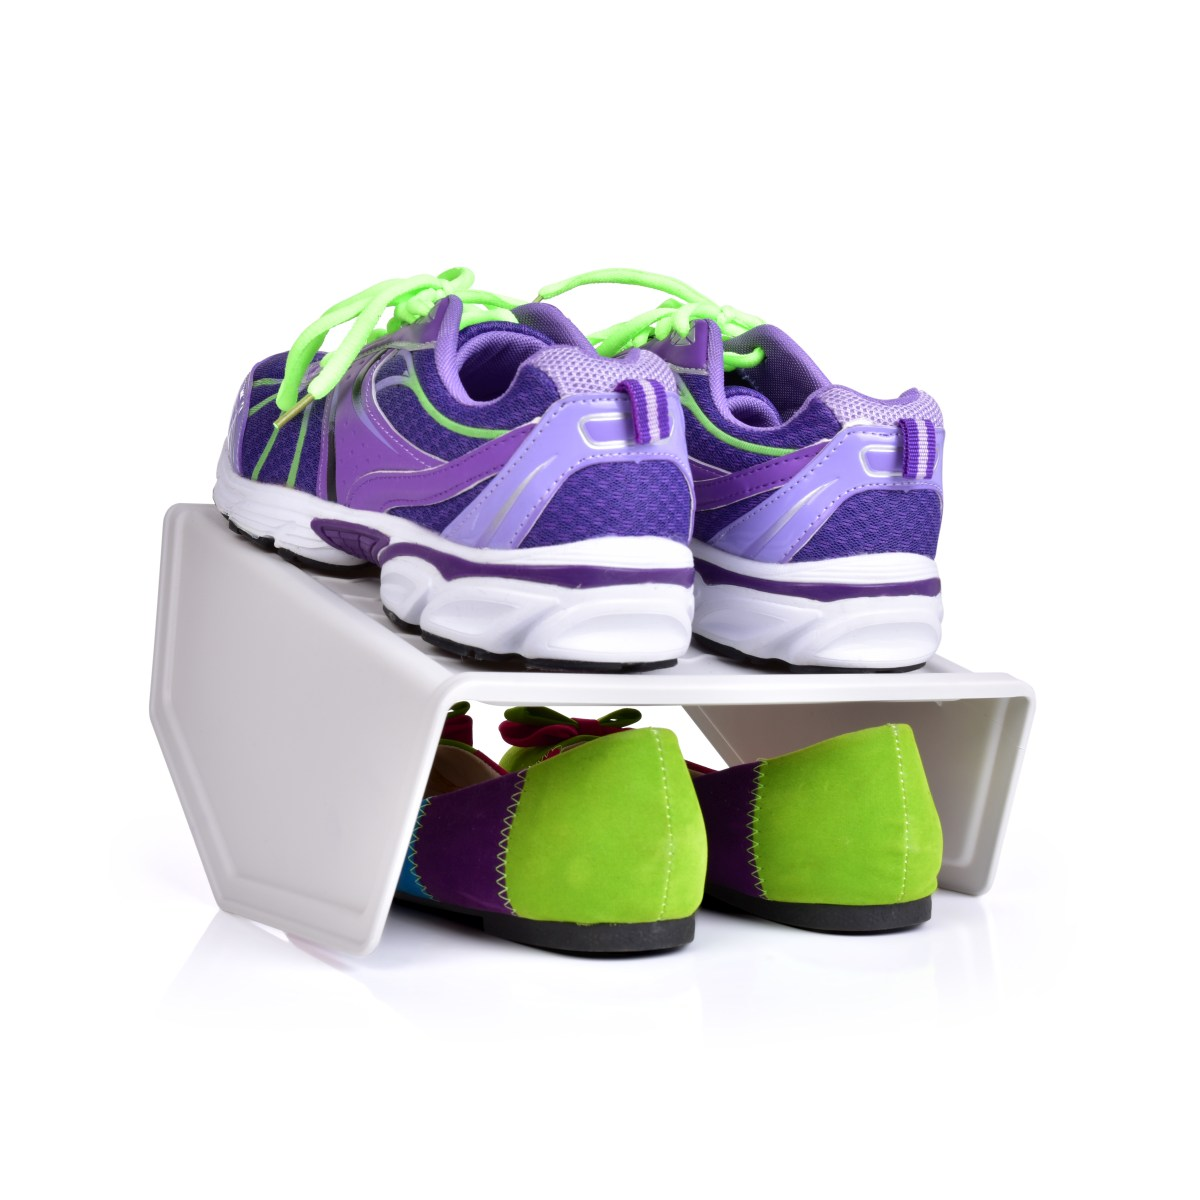 Dvojpárový BOTOŠTOS Stojan na topánky biely